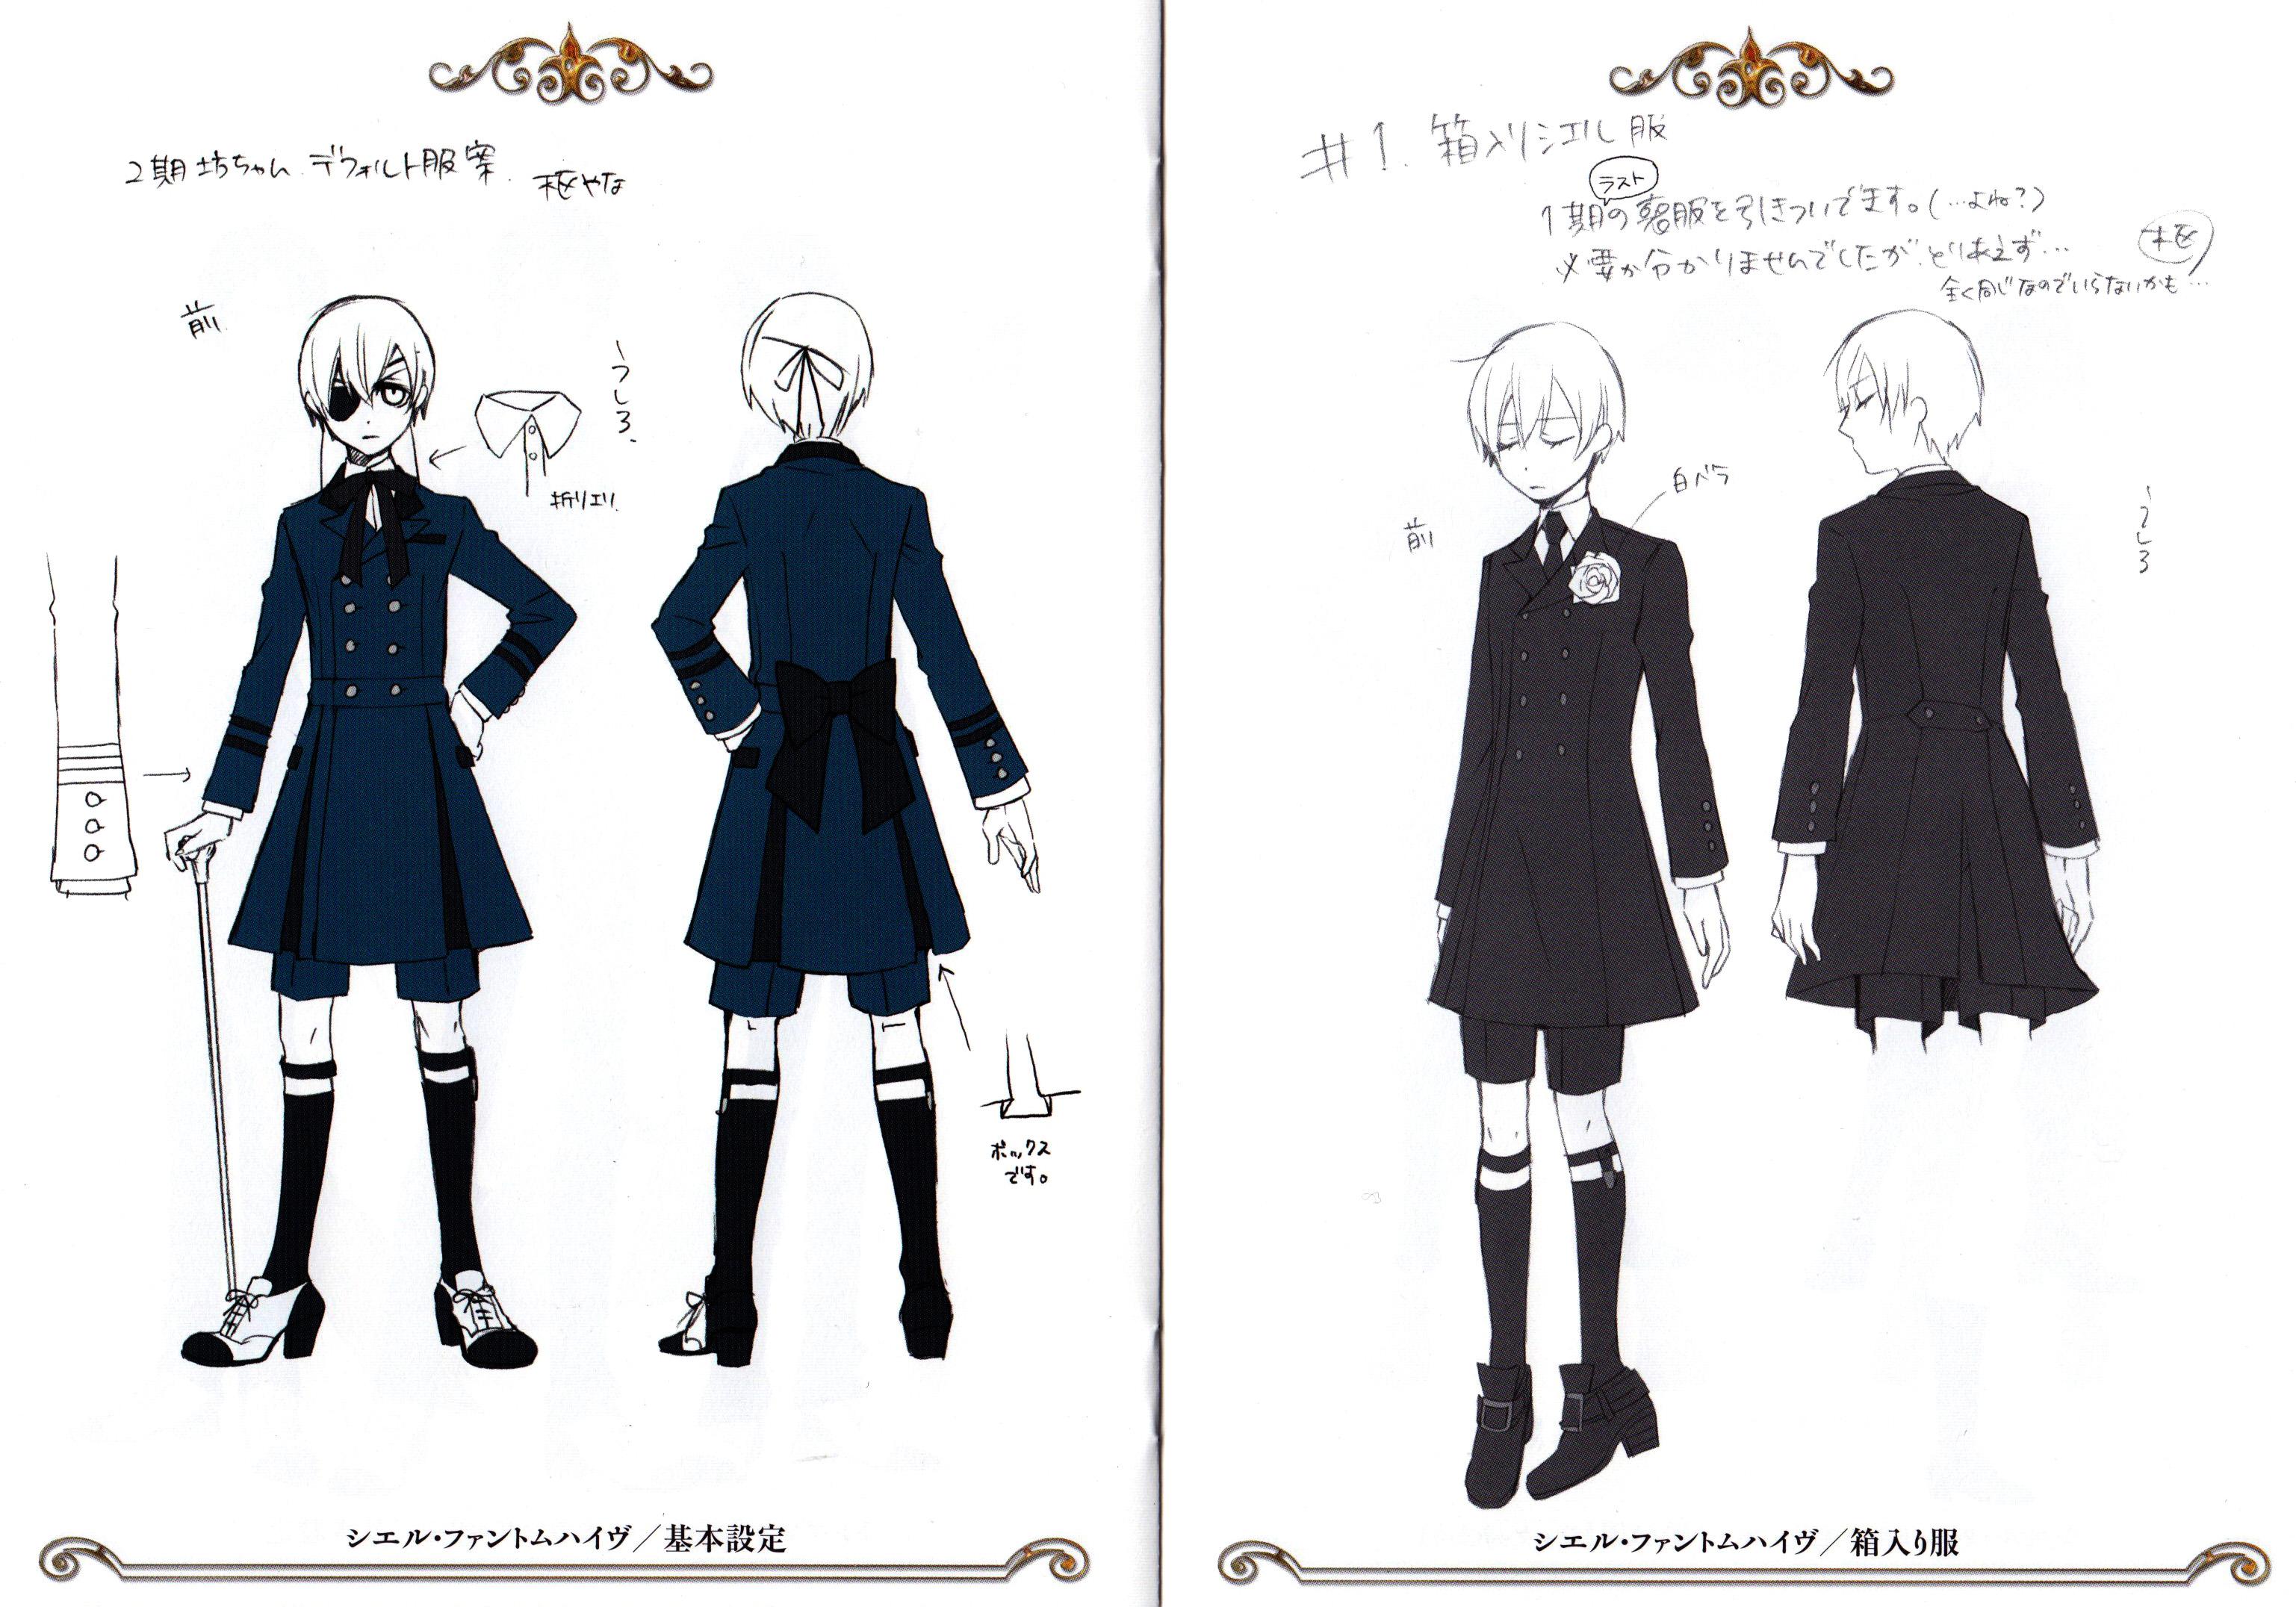 Kuroshitsuji Character Design Book : Ciel phantomhive kuroshitsuji image  zerochan